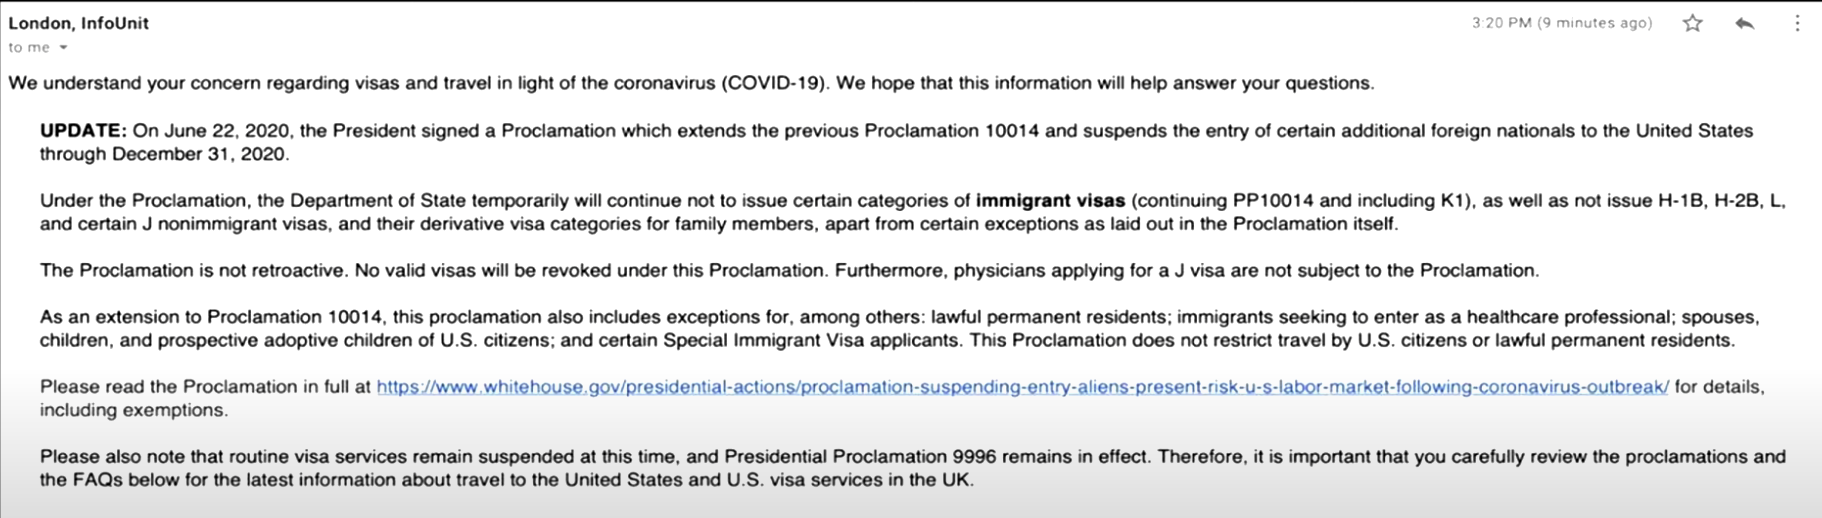 https://www.immigrationlawyerblog.com/files/2020/06/Screen-Shot-2020-06-29-at-12.24.48-PM.png